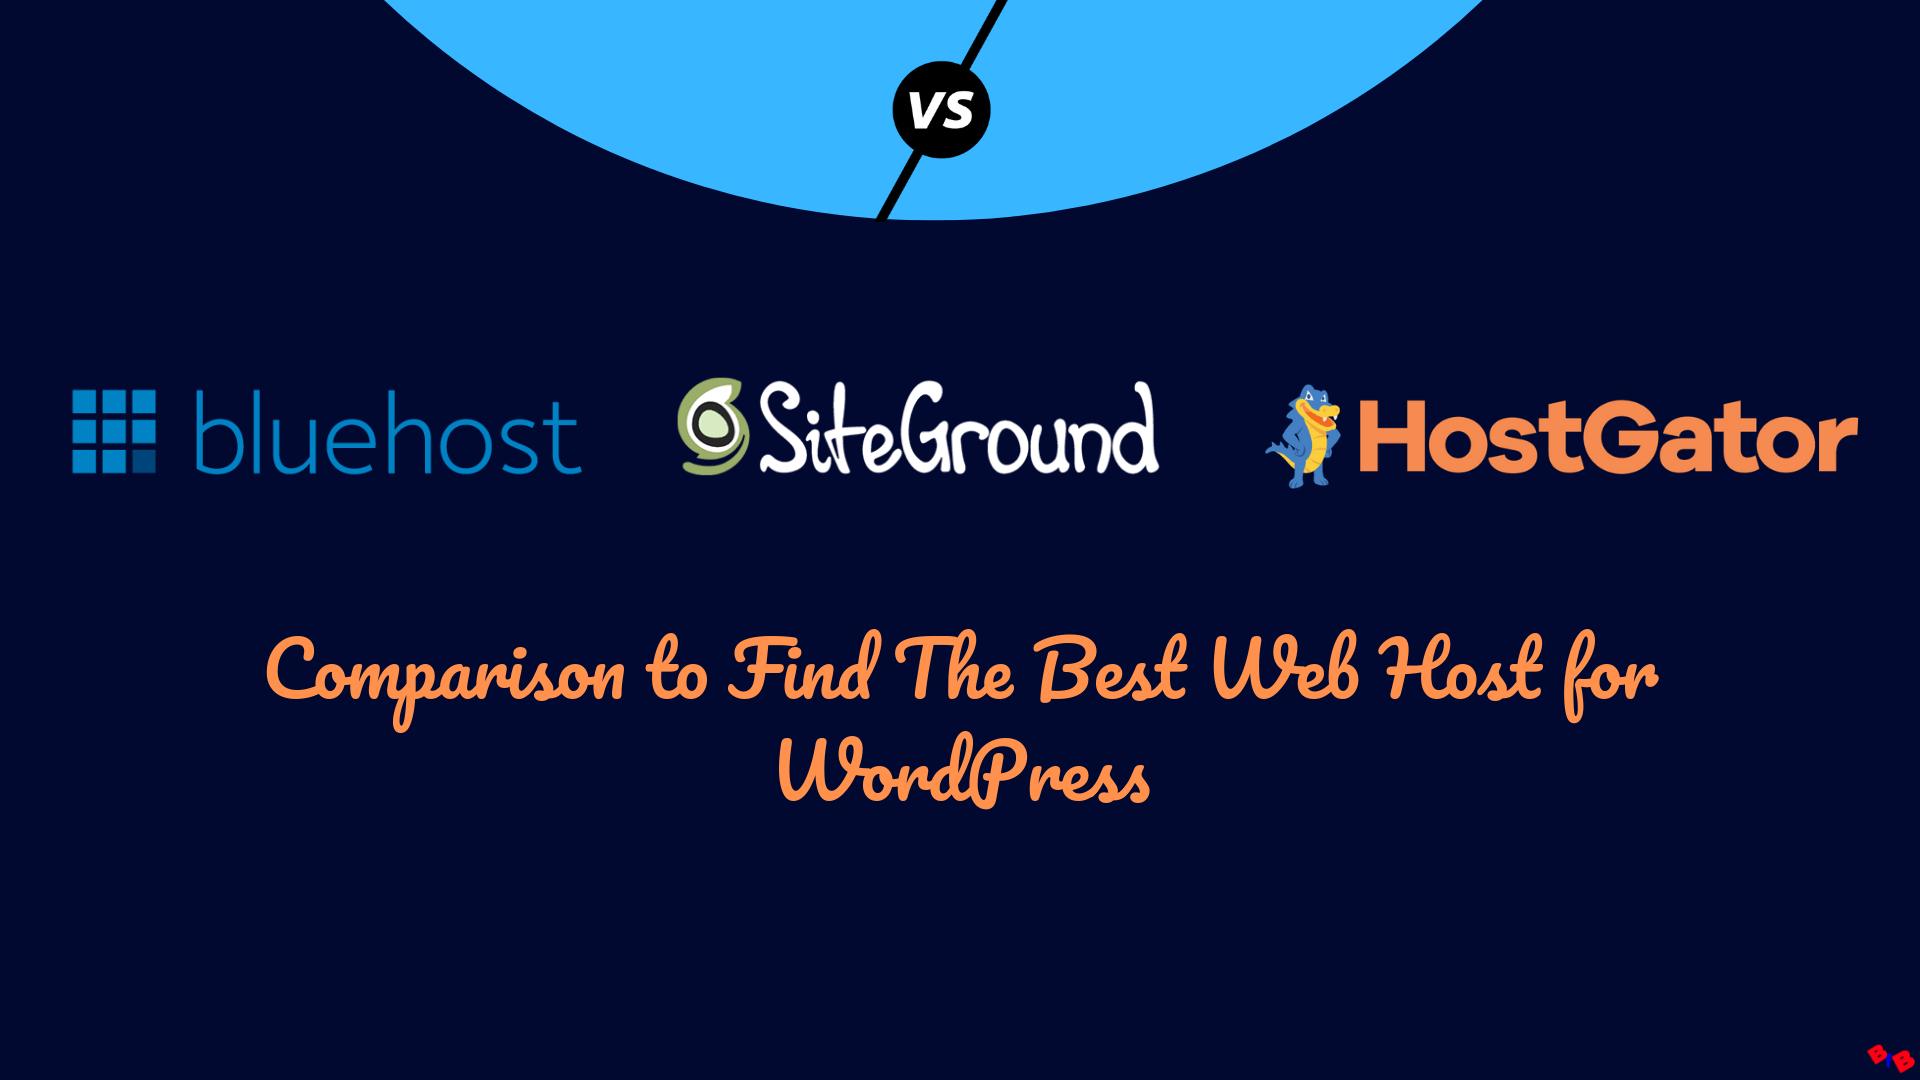 Siteground-vs-Hostgator-vs-Bluehost-comparison